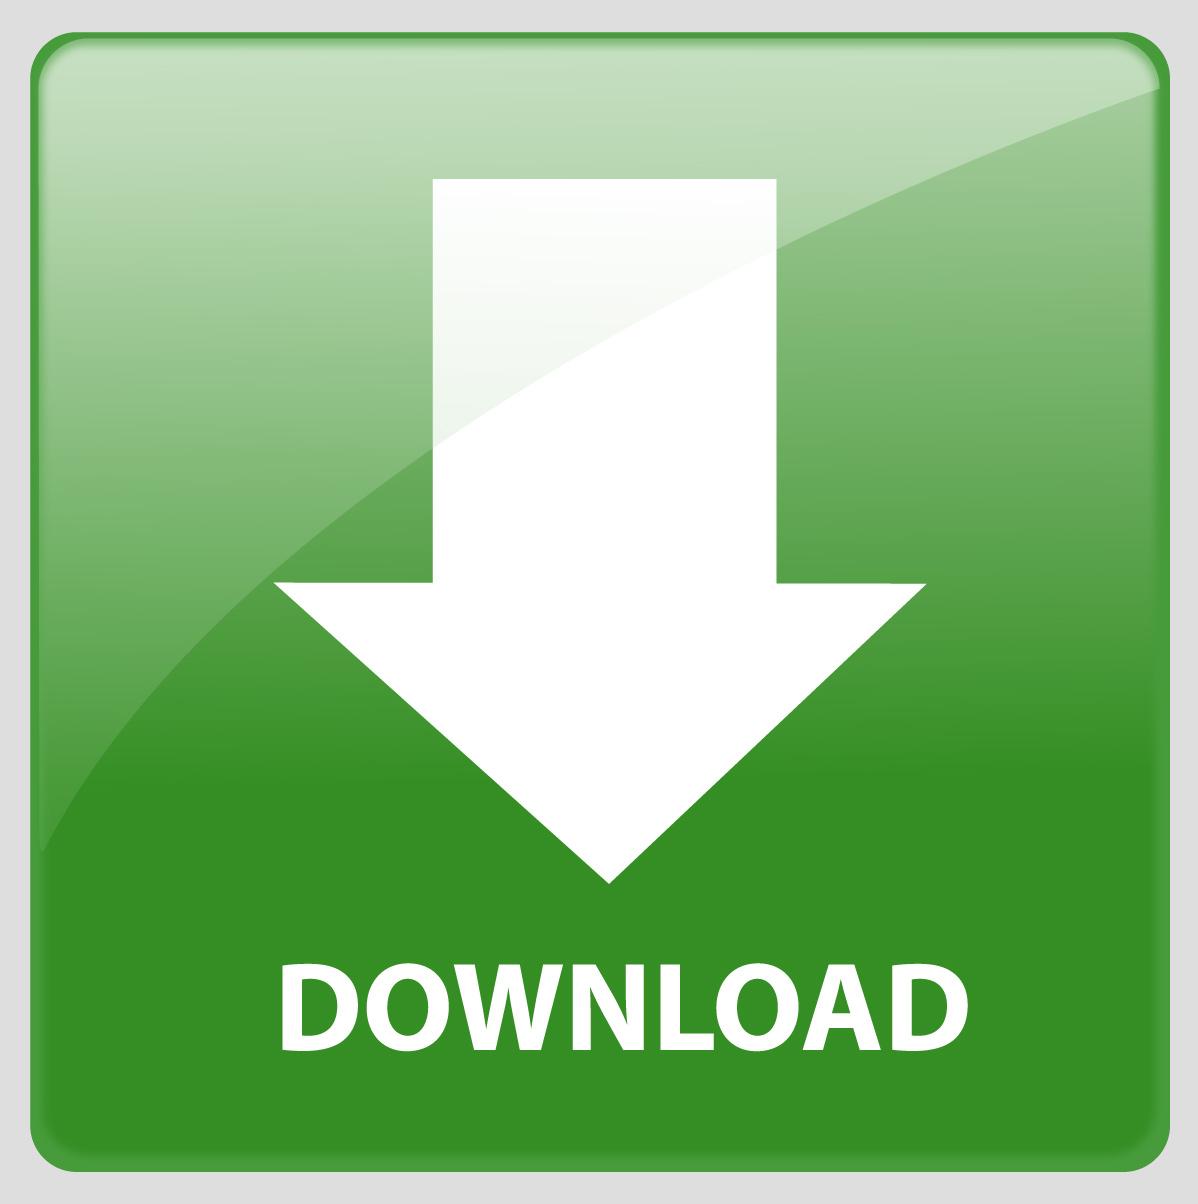 DPS download